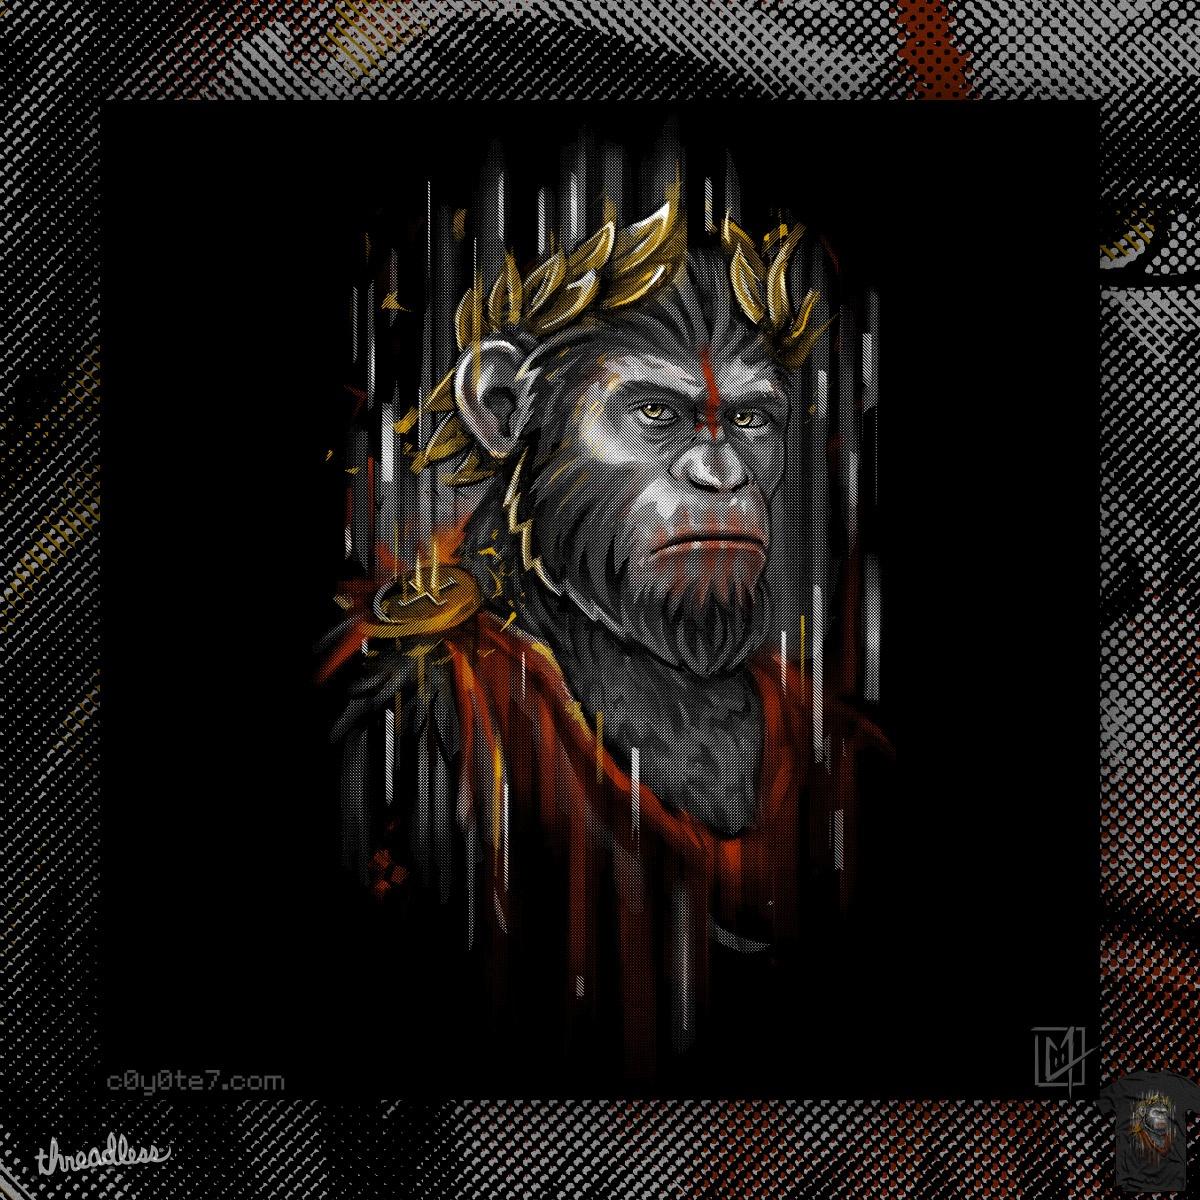 Caesar Ape by c0y0te7 on Threadless